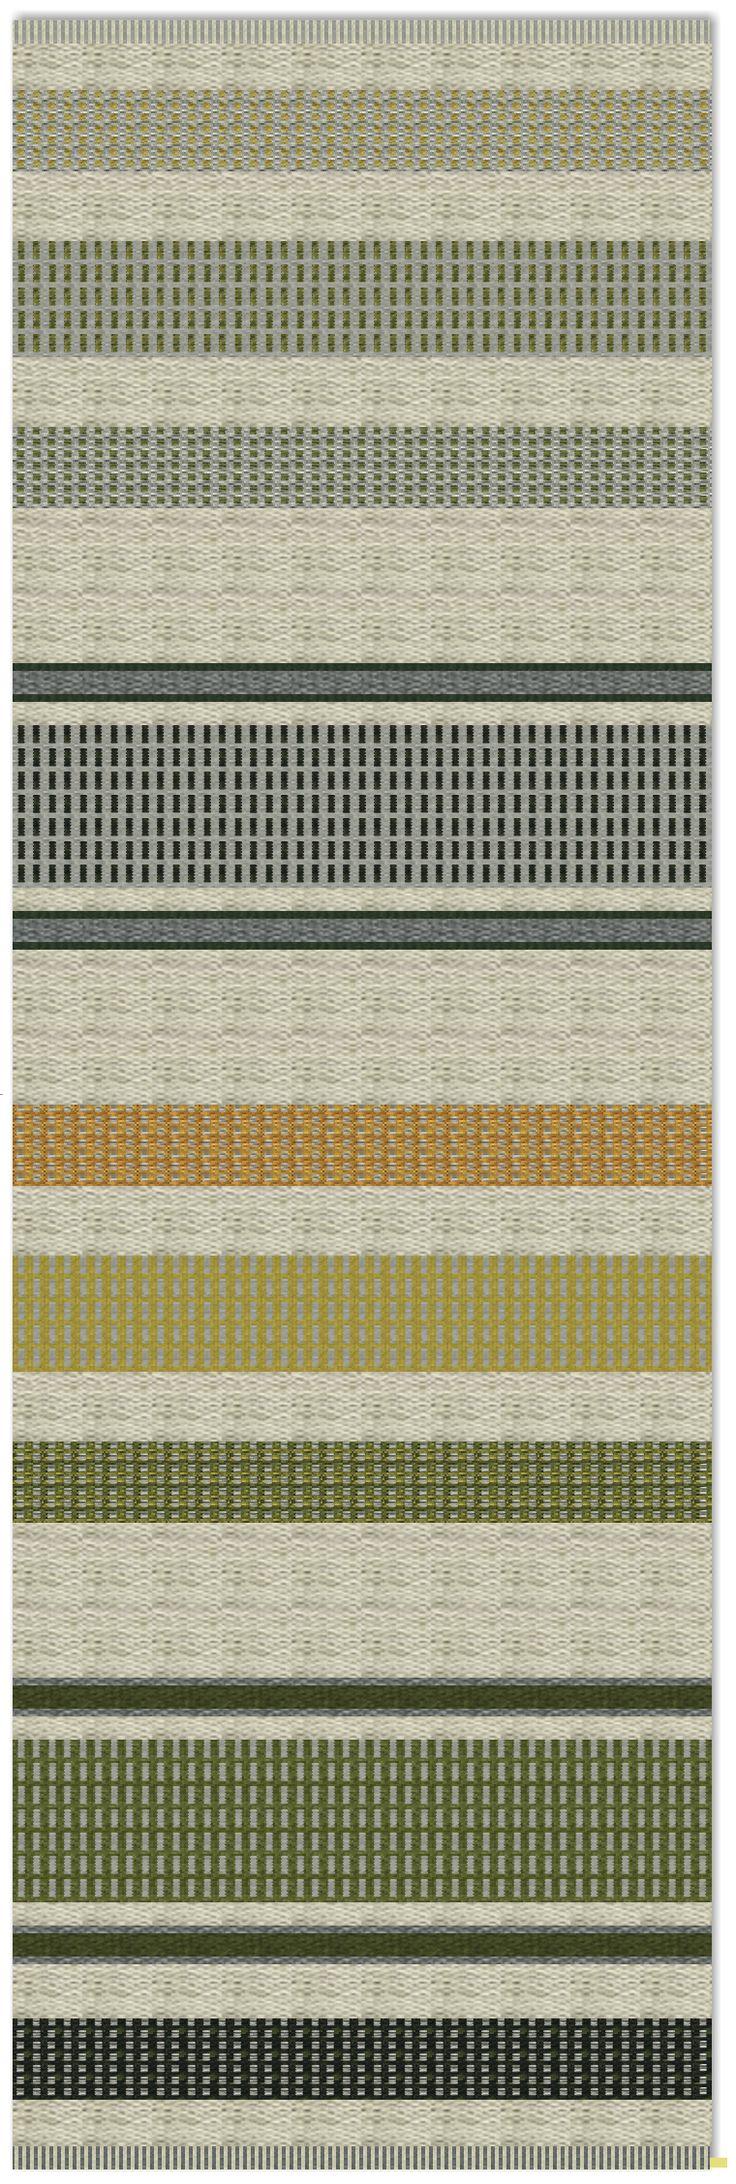 Navy greek key rug transitional entrance foyer libby langdon - Hagga Post Dot Woven Wool Rug Color Custom Green Autumn Size 2